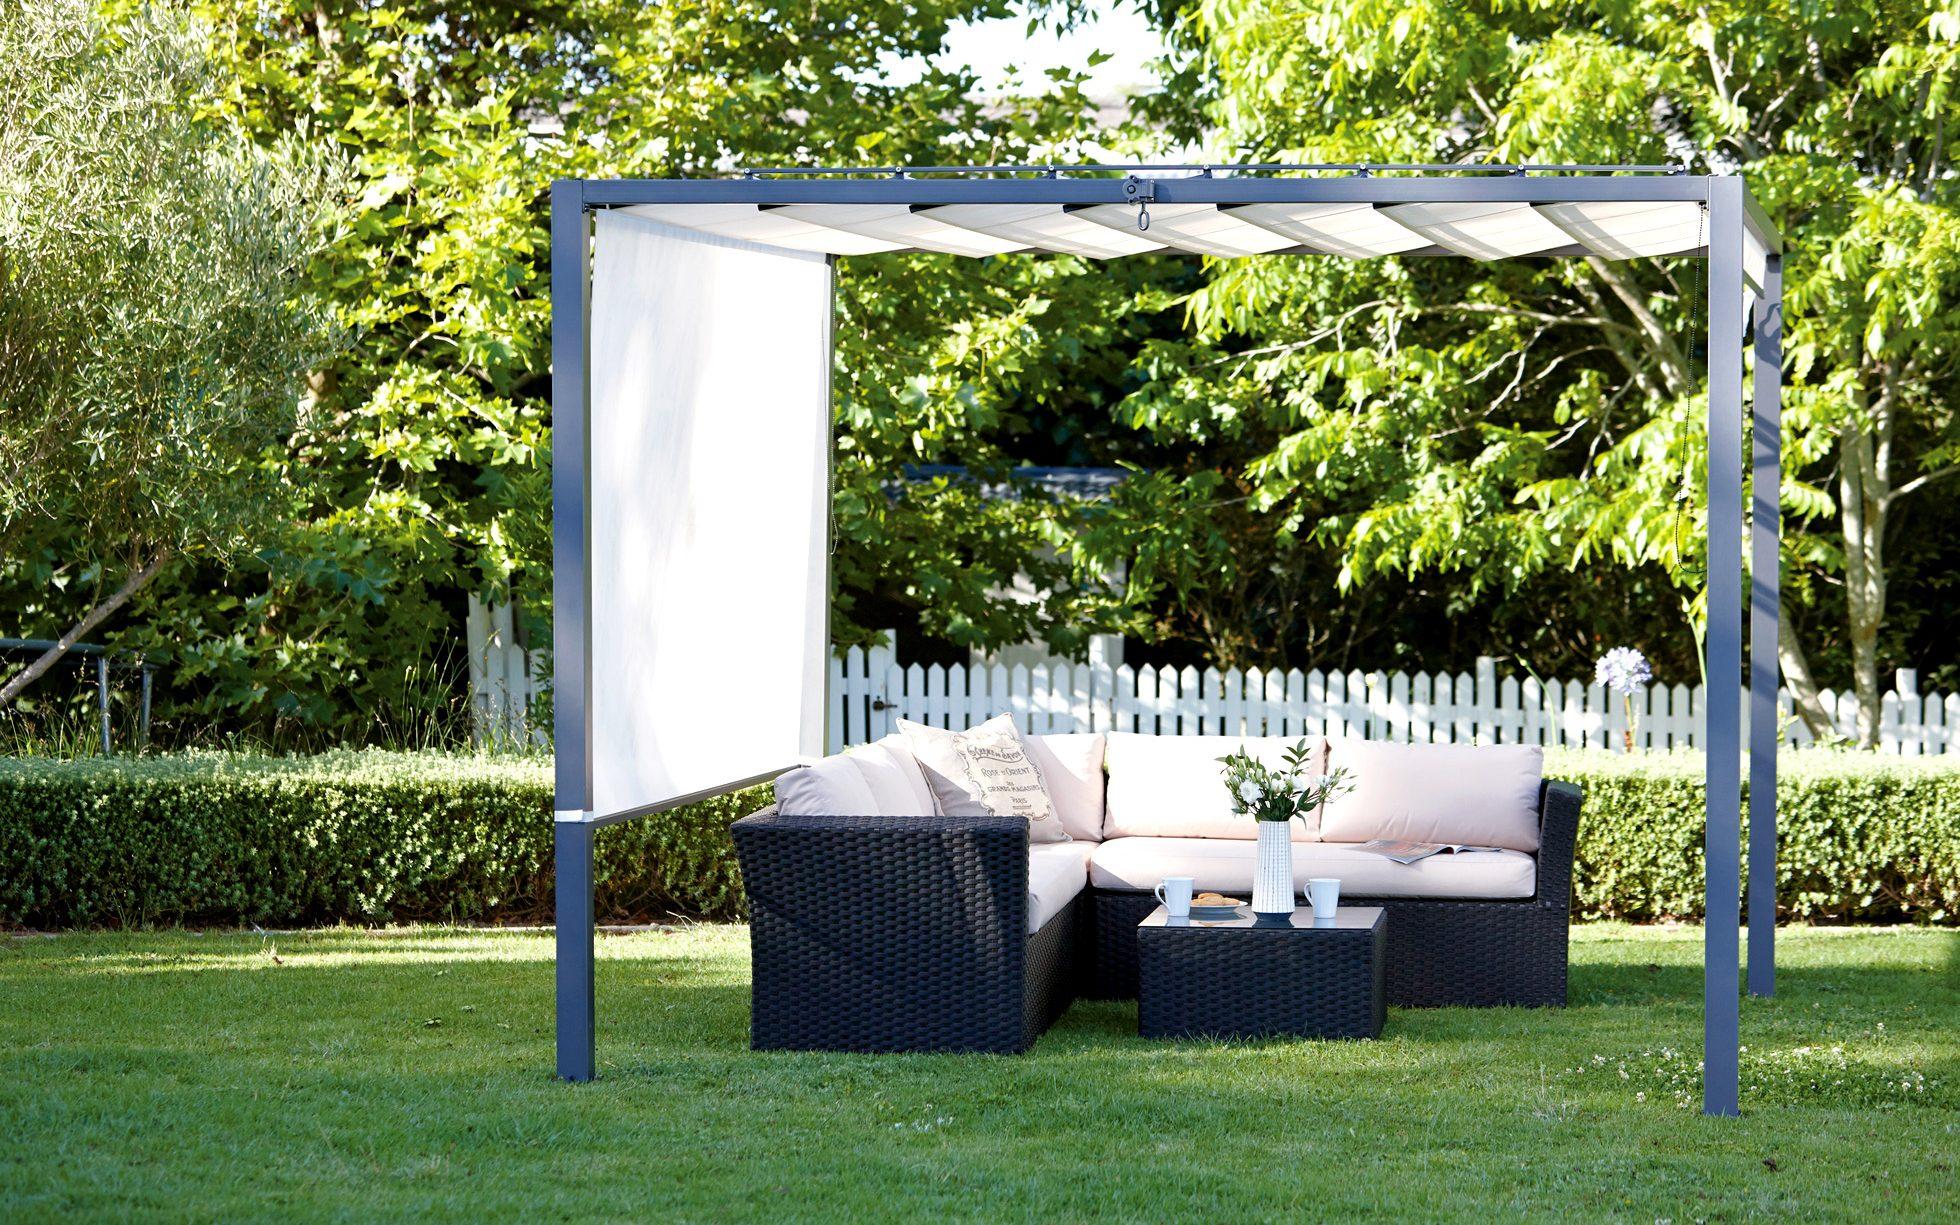 Stylish and beautiful garden shelter